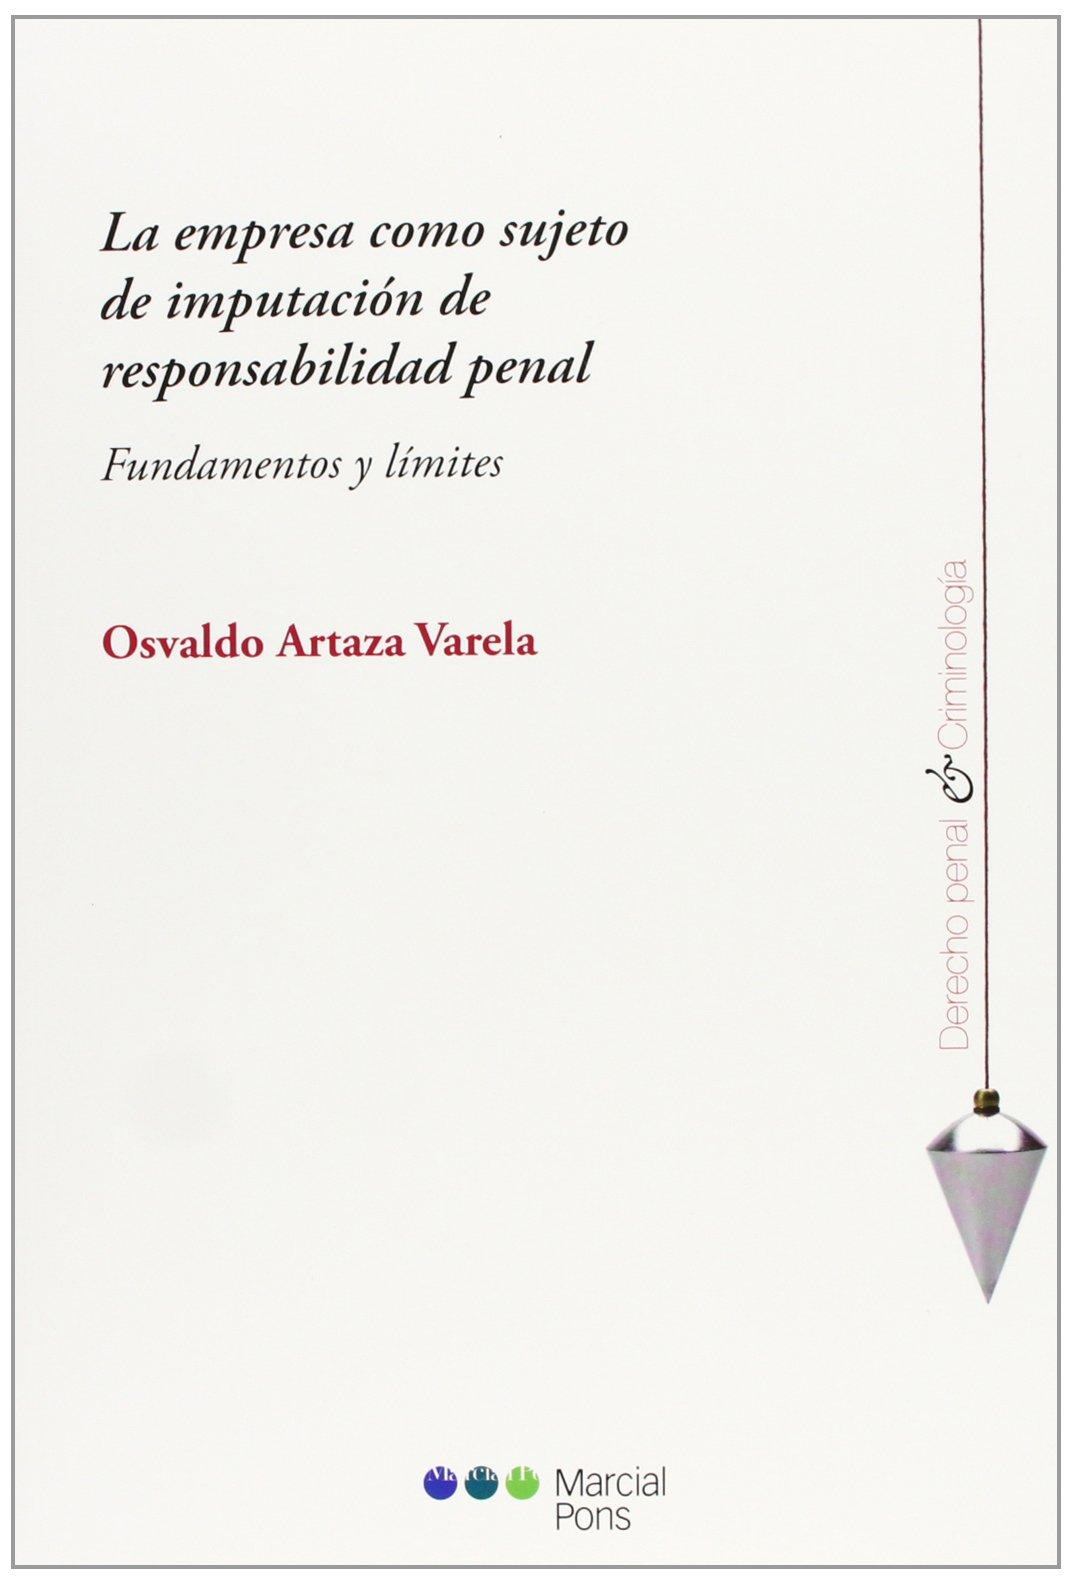 EMPRESA COMO SUJETO DE IMPUTACION DE RESPONSABILIDAD PENAL, LA. FUNDAMENTOS Y LIMITES: Osvaldo ARTAZA VARELA: 9788415664321: Amazon.com: Books